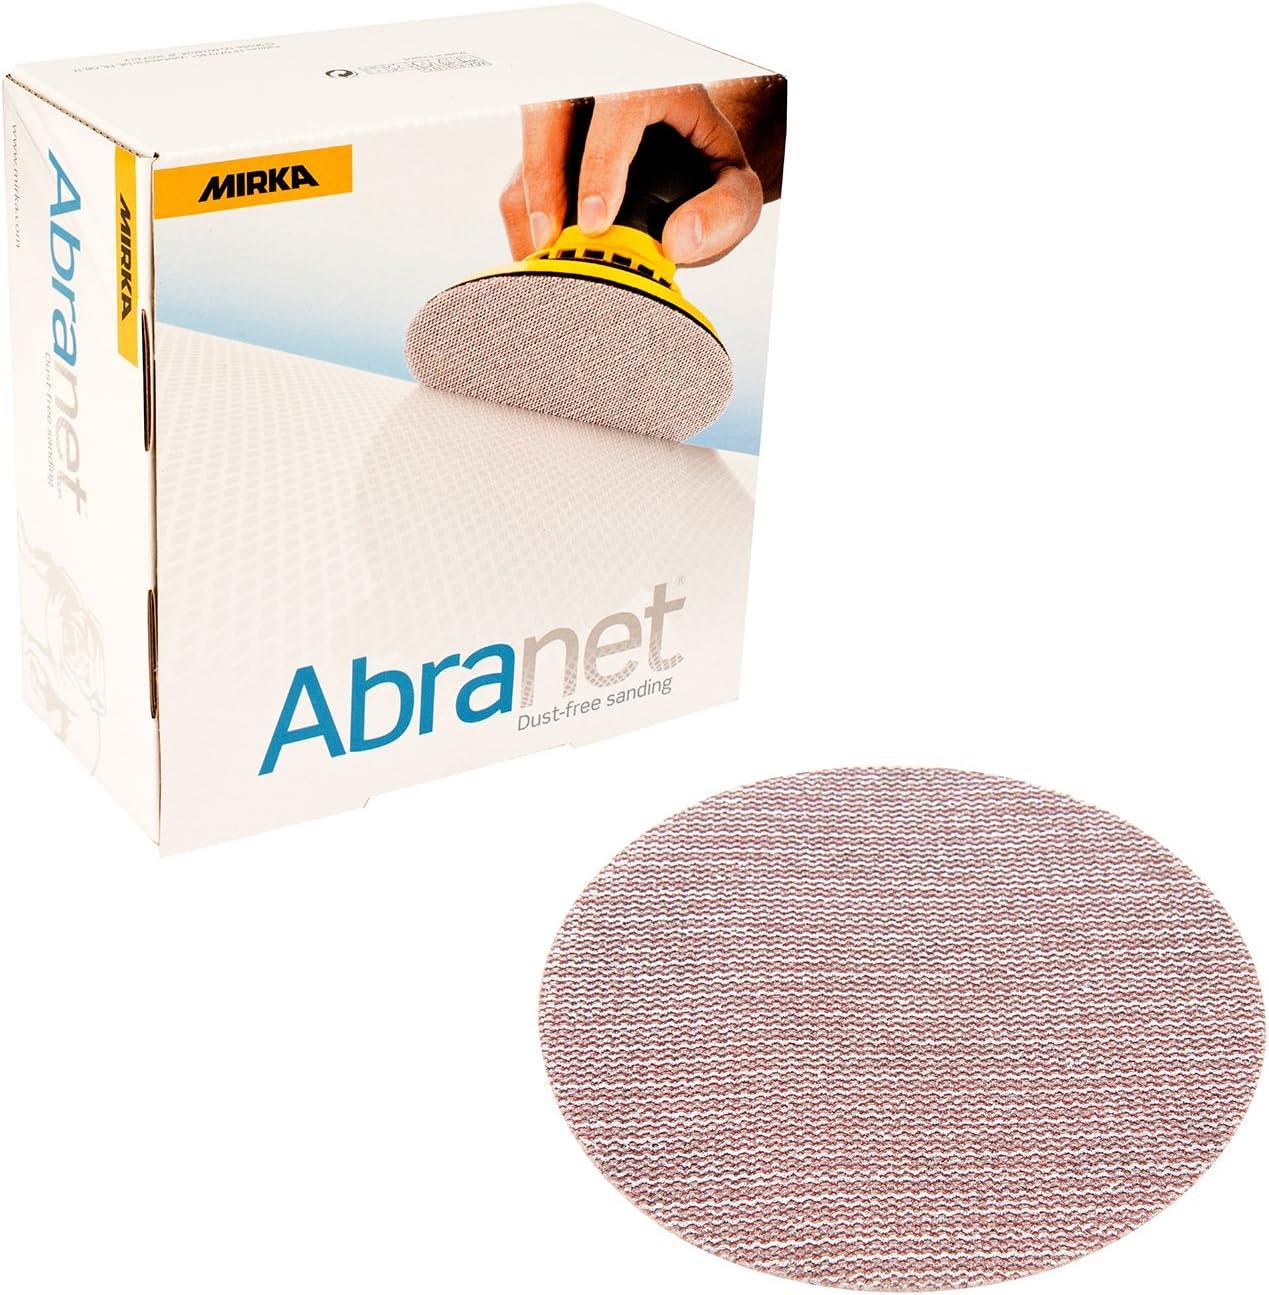 Mirka 9A-241-320 6-Inch 320 Grit Mesh Abrasive Dust Free Sanding Discs, Box of 50 Discs 81QhVYOx9jL